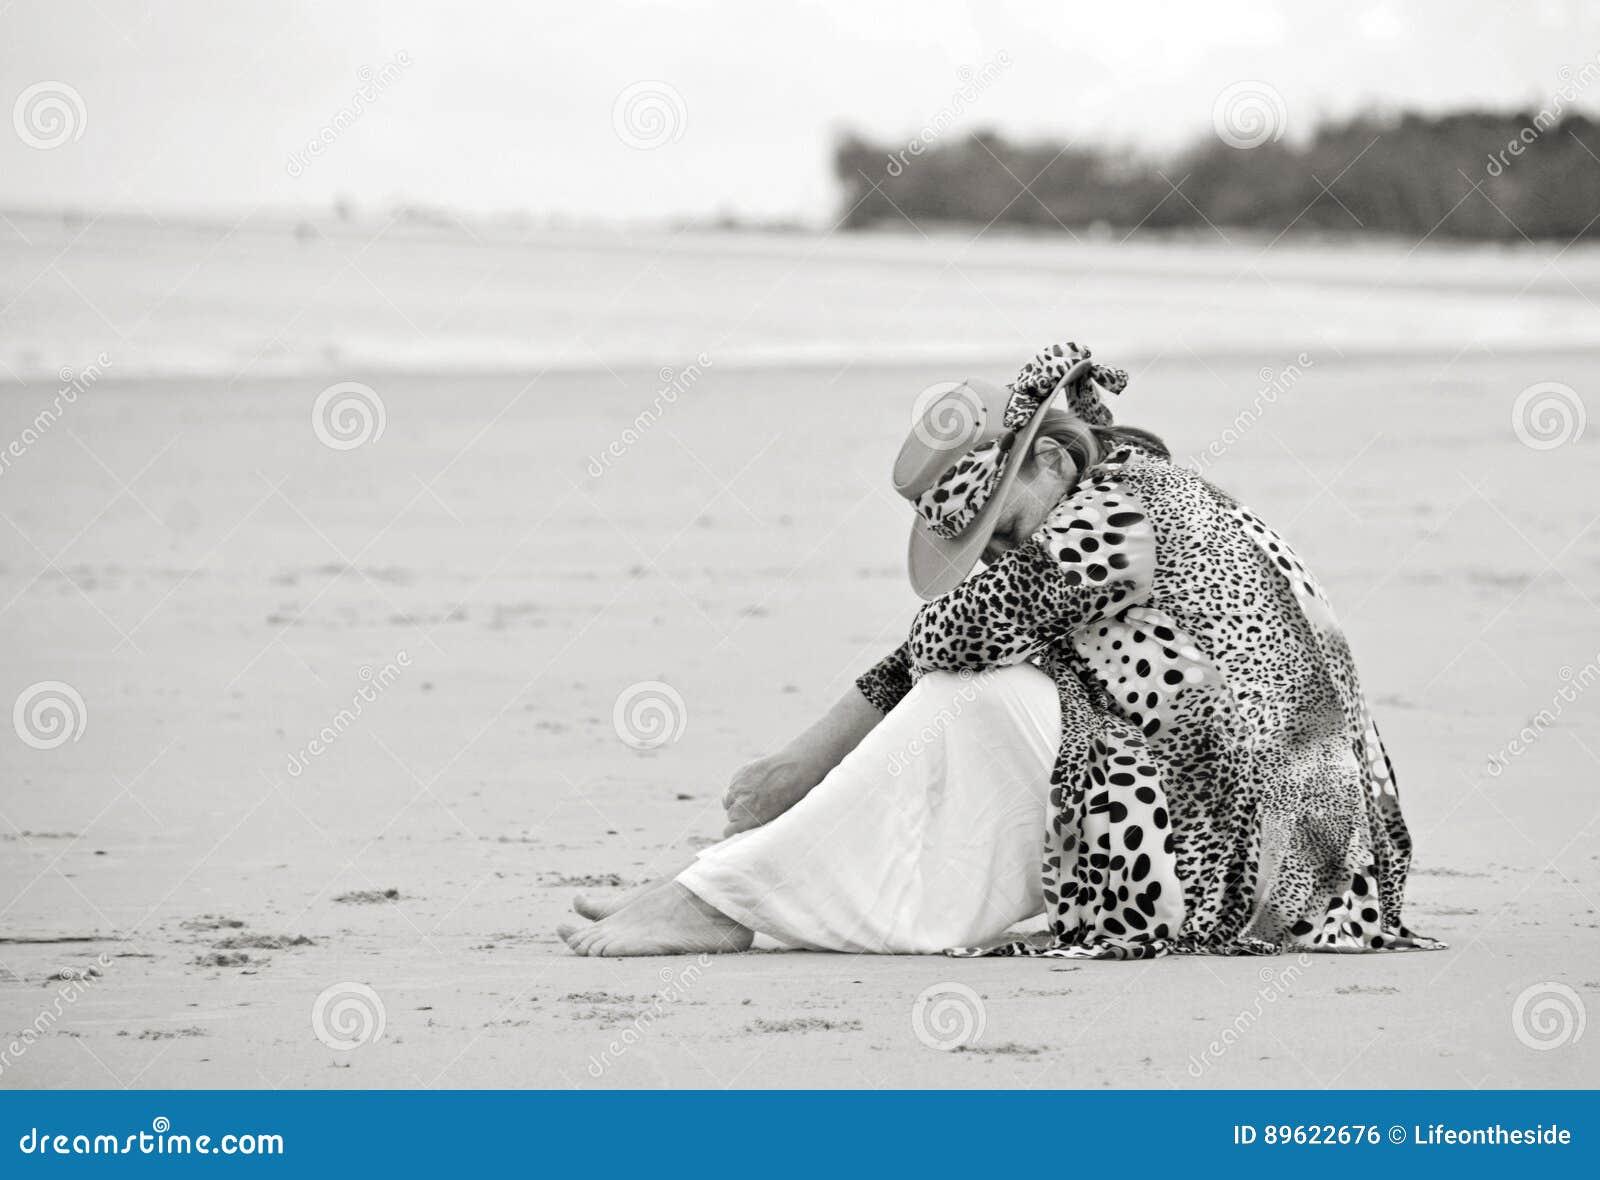 Sad depressed grieving woman sitting alone on empty beach